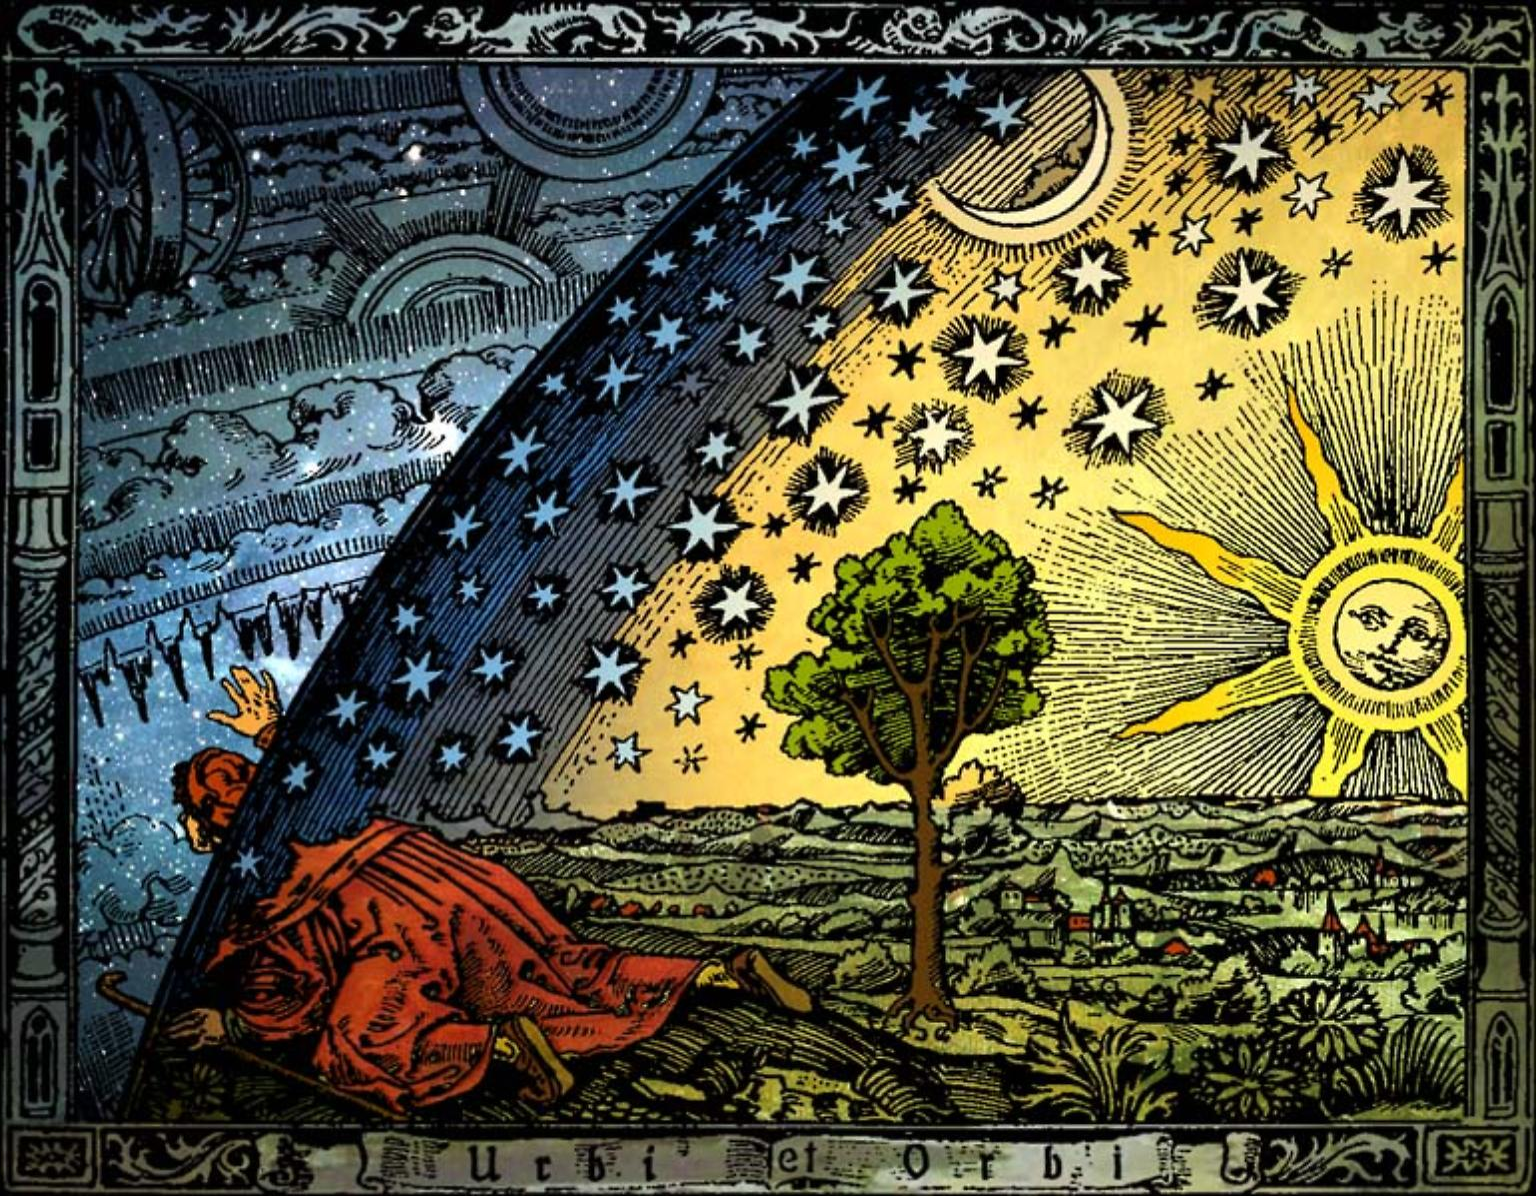 Flammarions Holzstich.jpg